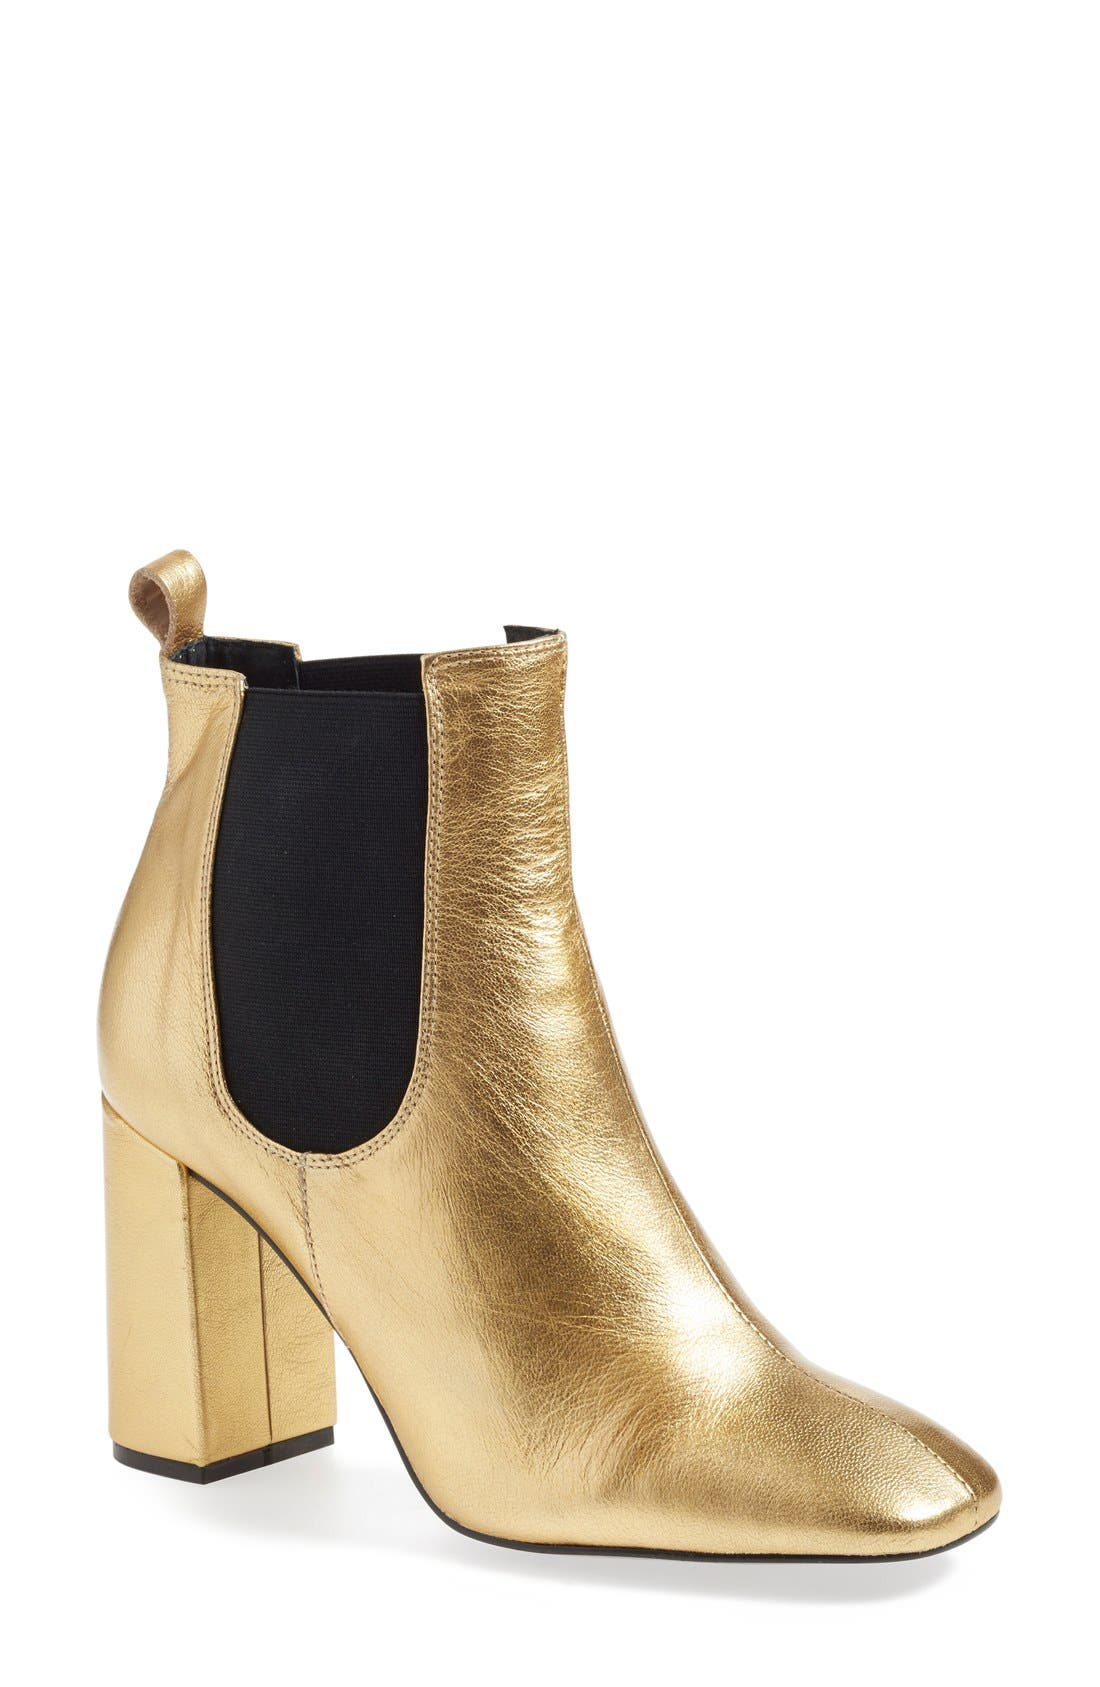 'Maria' Chelsea Block Heel Boot,                             Main thumbnail 1, color,                             710